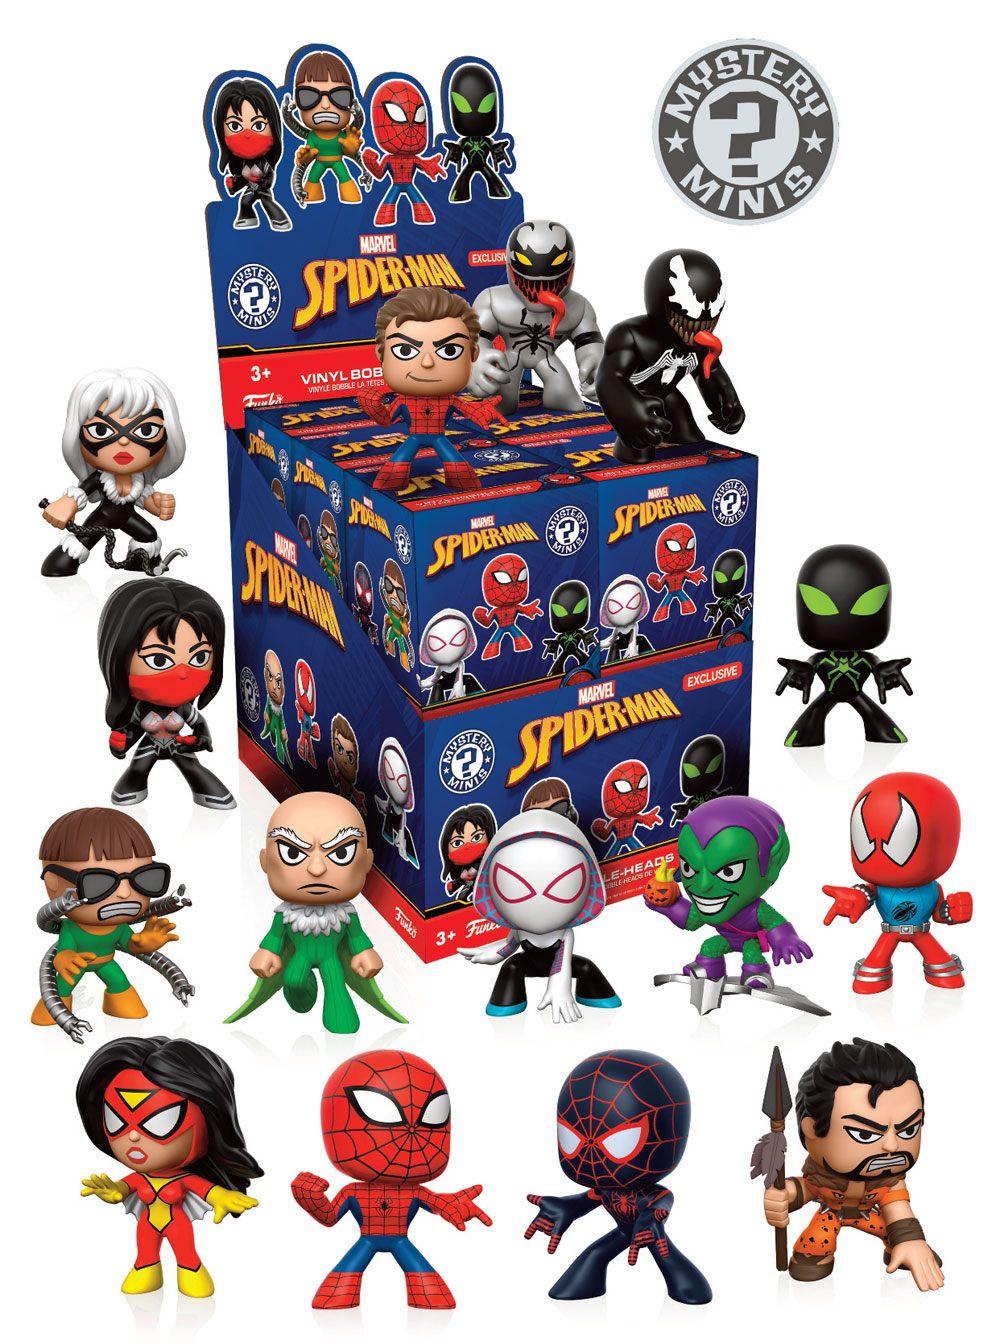 Marvel Comics Mystery Mini Figures 5 cm Display Spider-Man Variant Mix 2 (12)